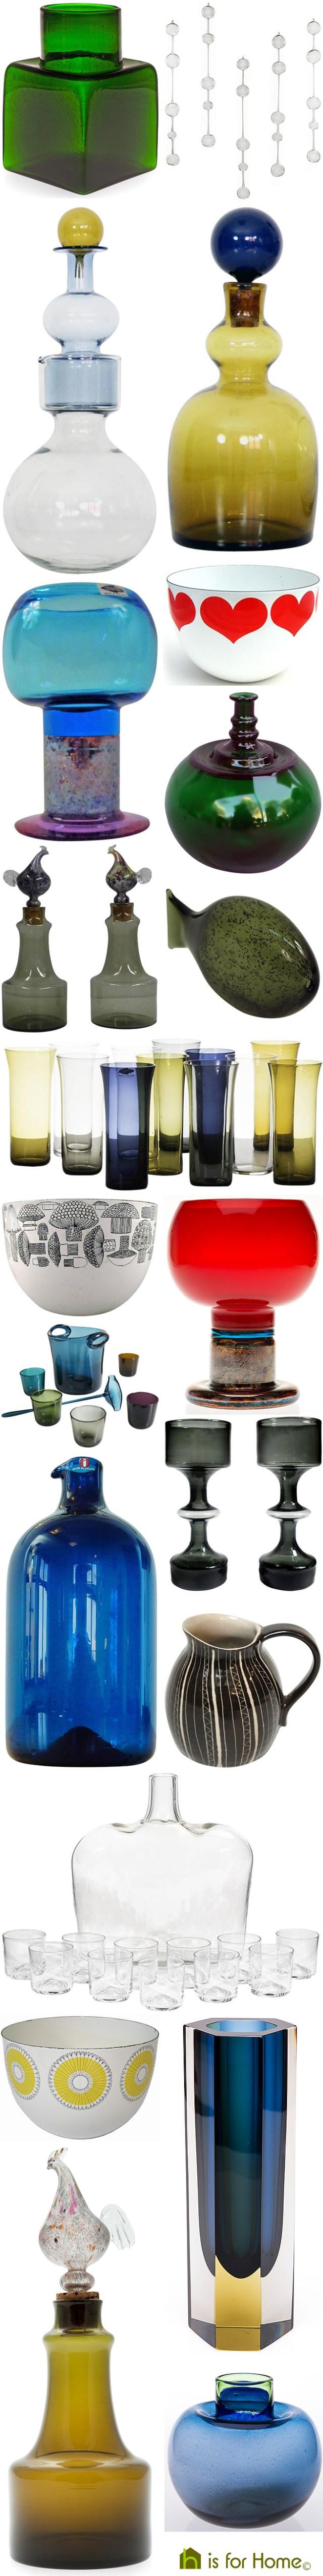 Mosaic of Kaj Franck designs   H is for Home